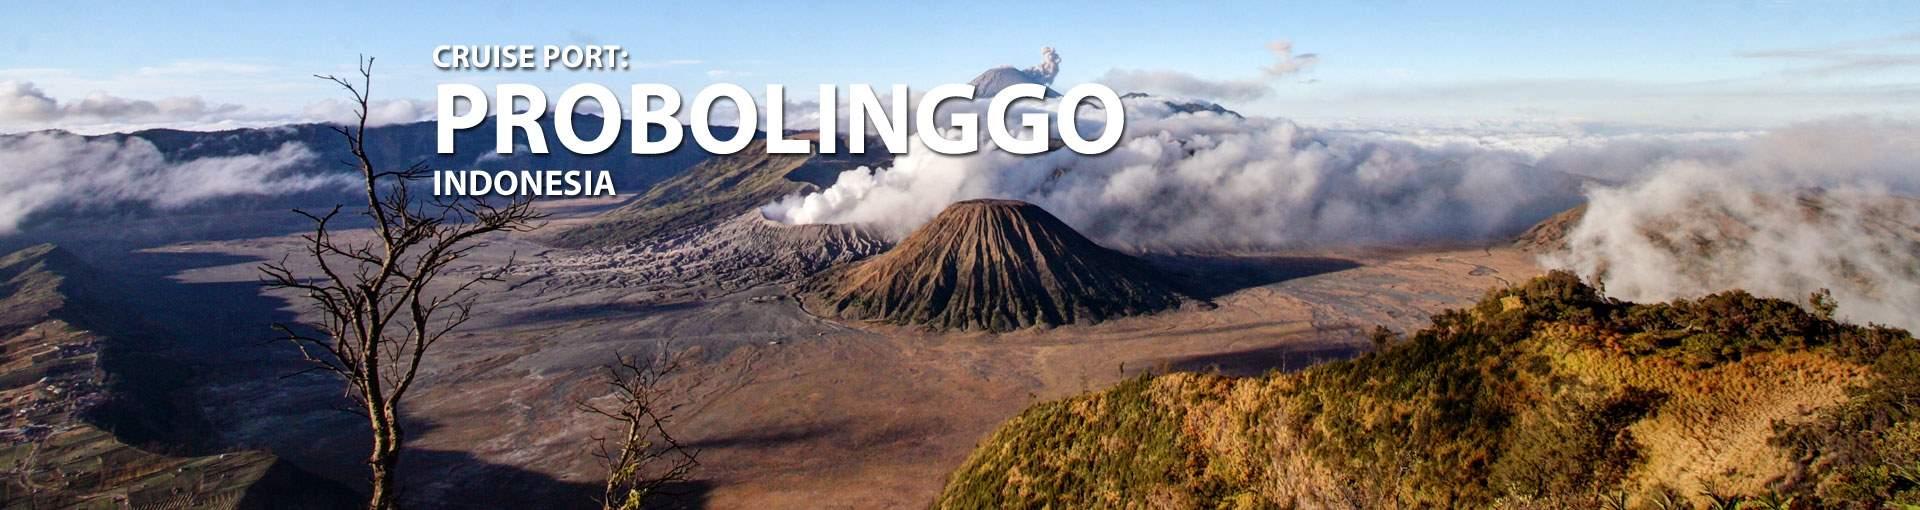 Cruises to Probolinggo, Indonesia